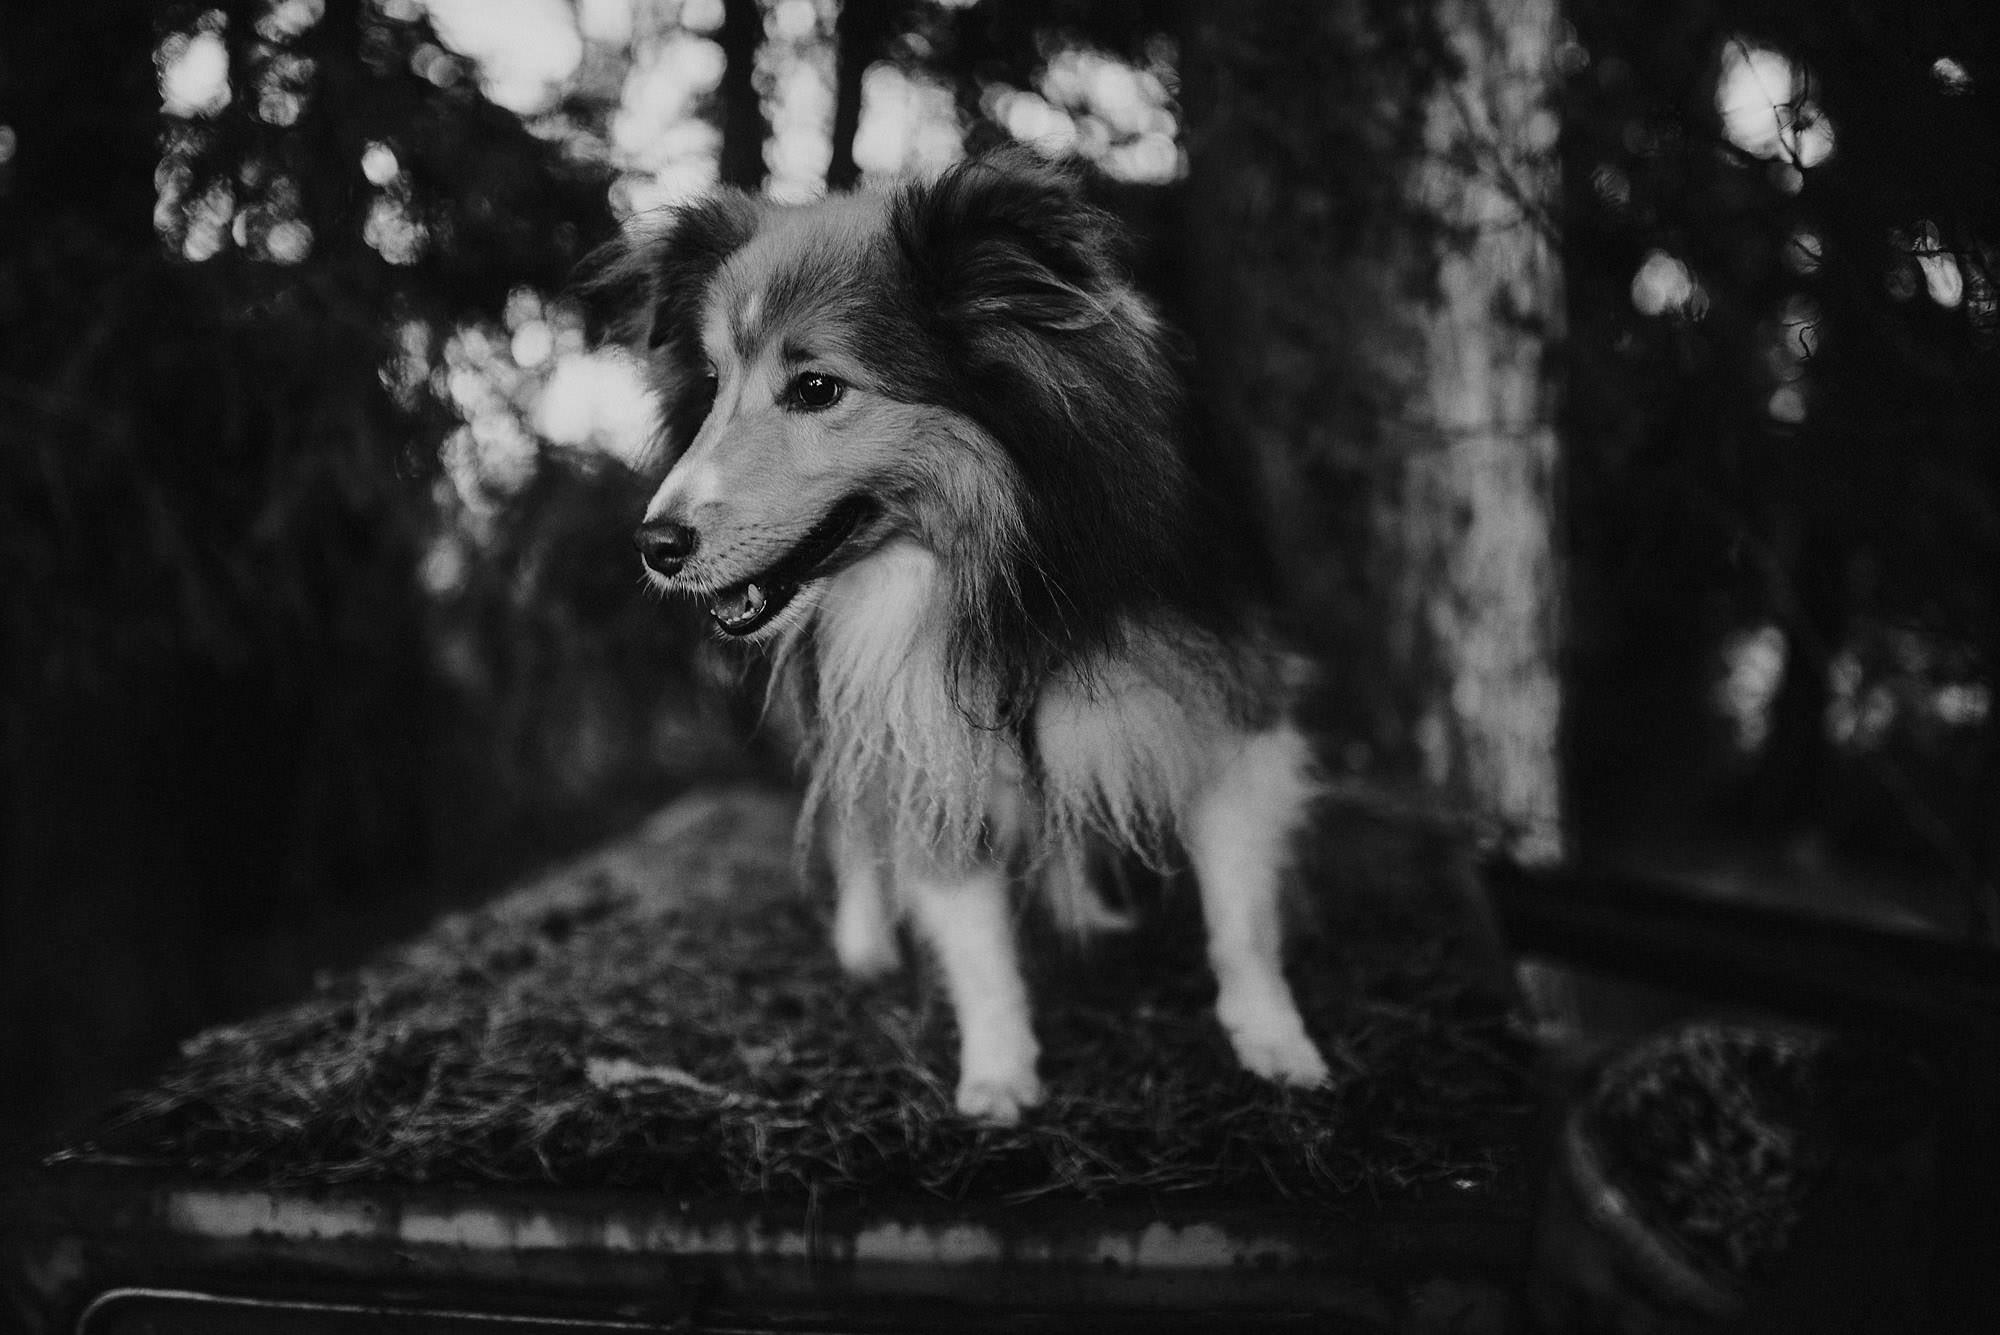 seppo koira viestintäliiga